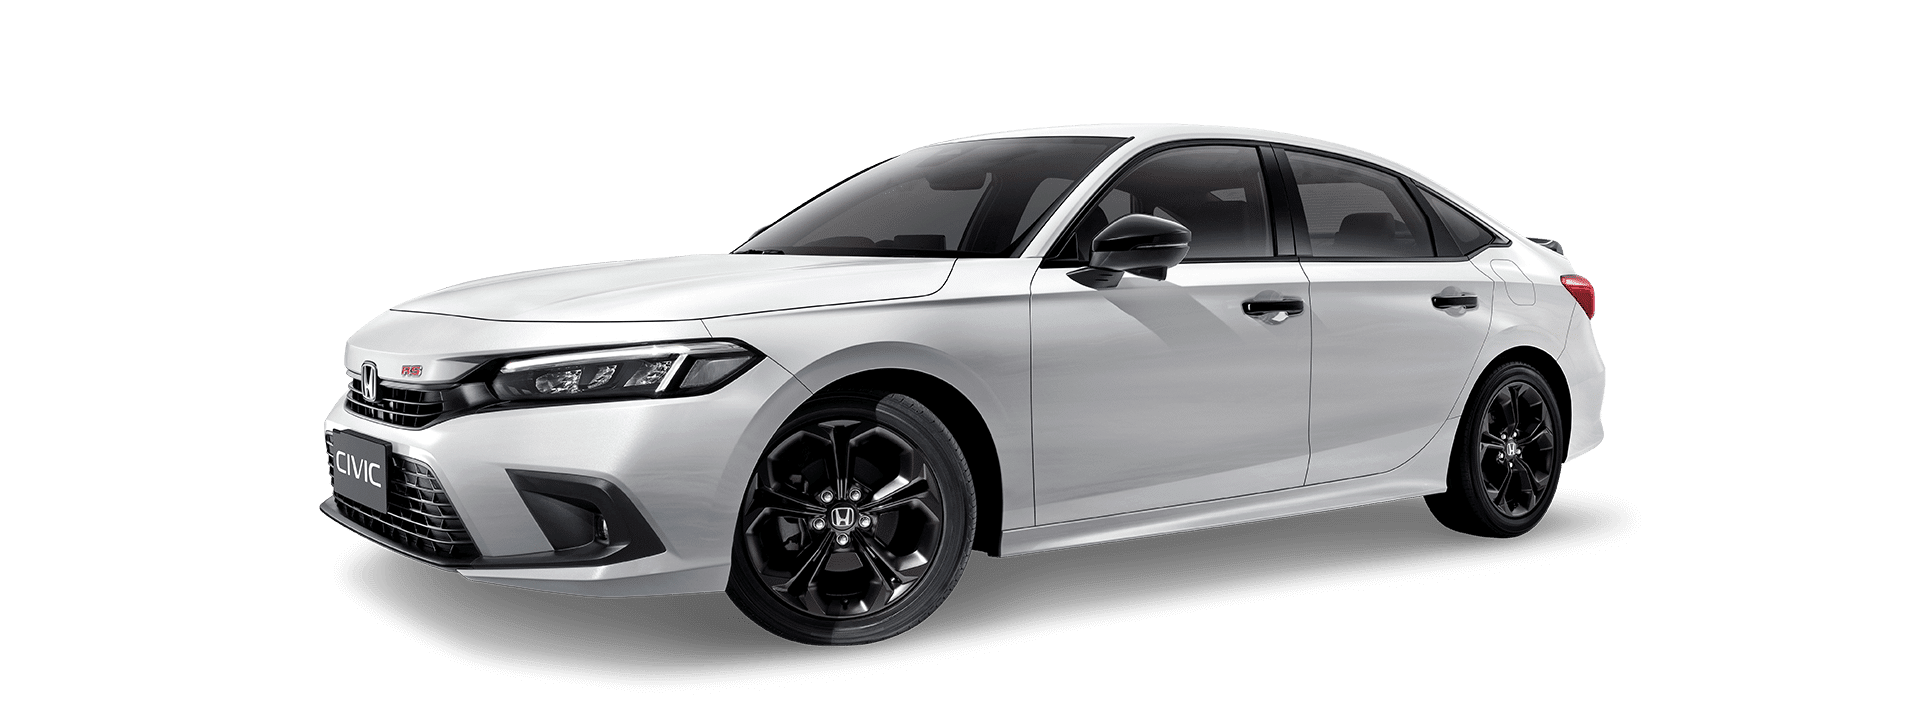 3. Honda Civic 2022 รุ่น RS ราคา 1,199,900 บาท